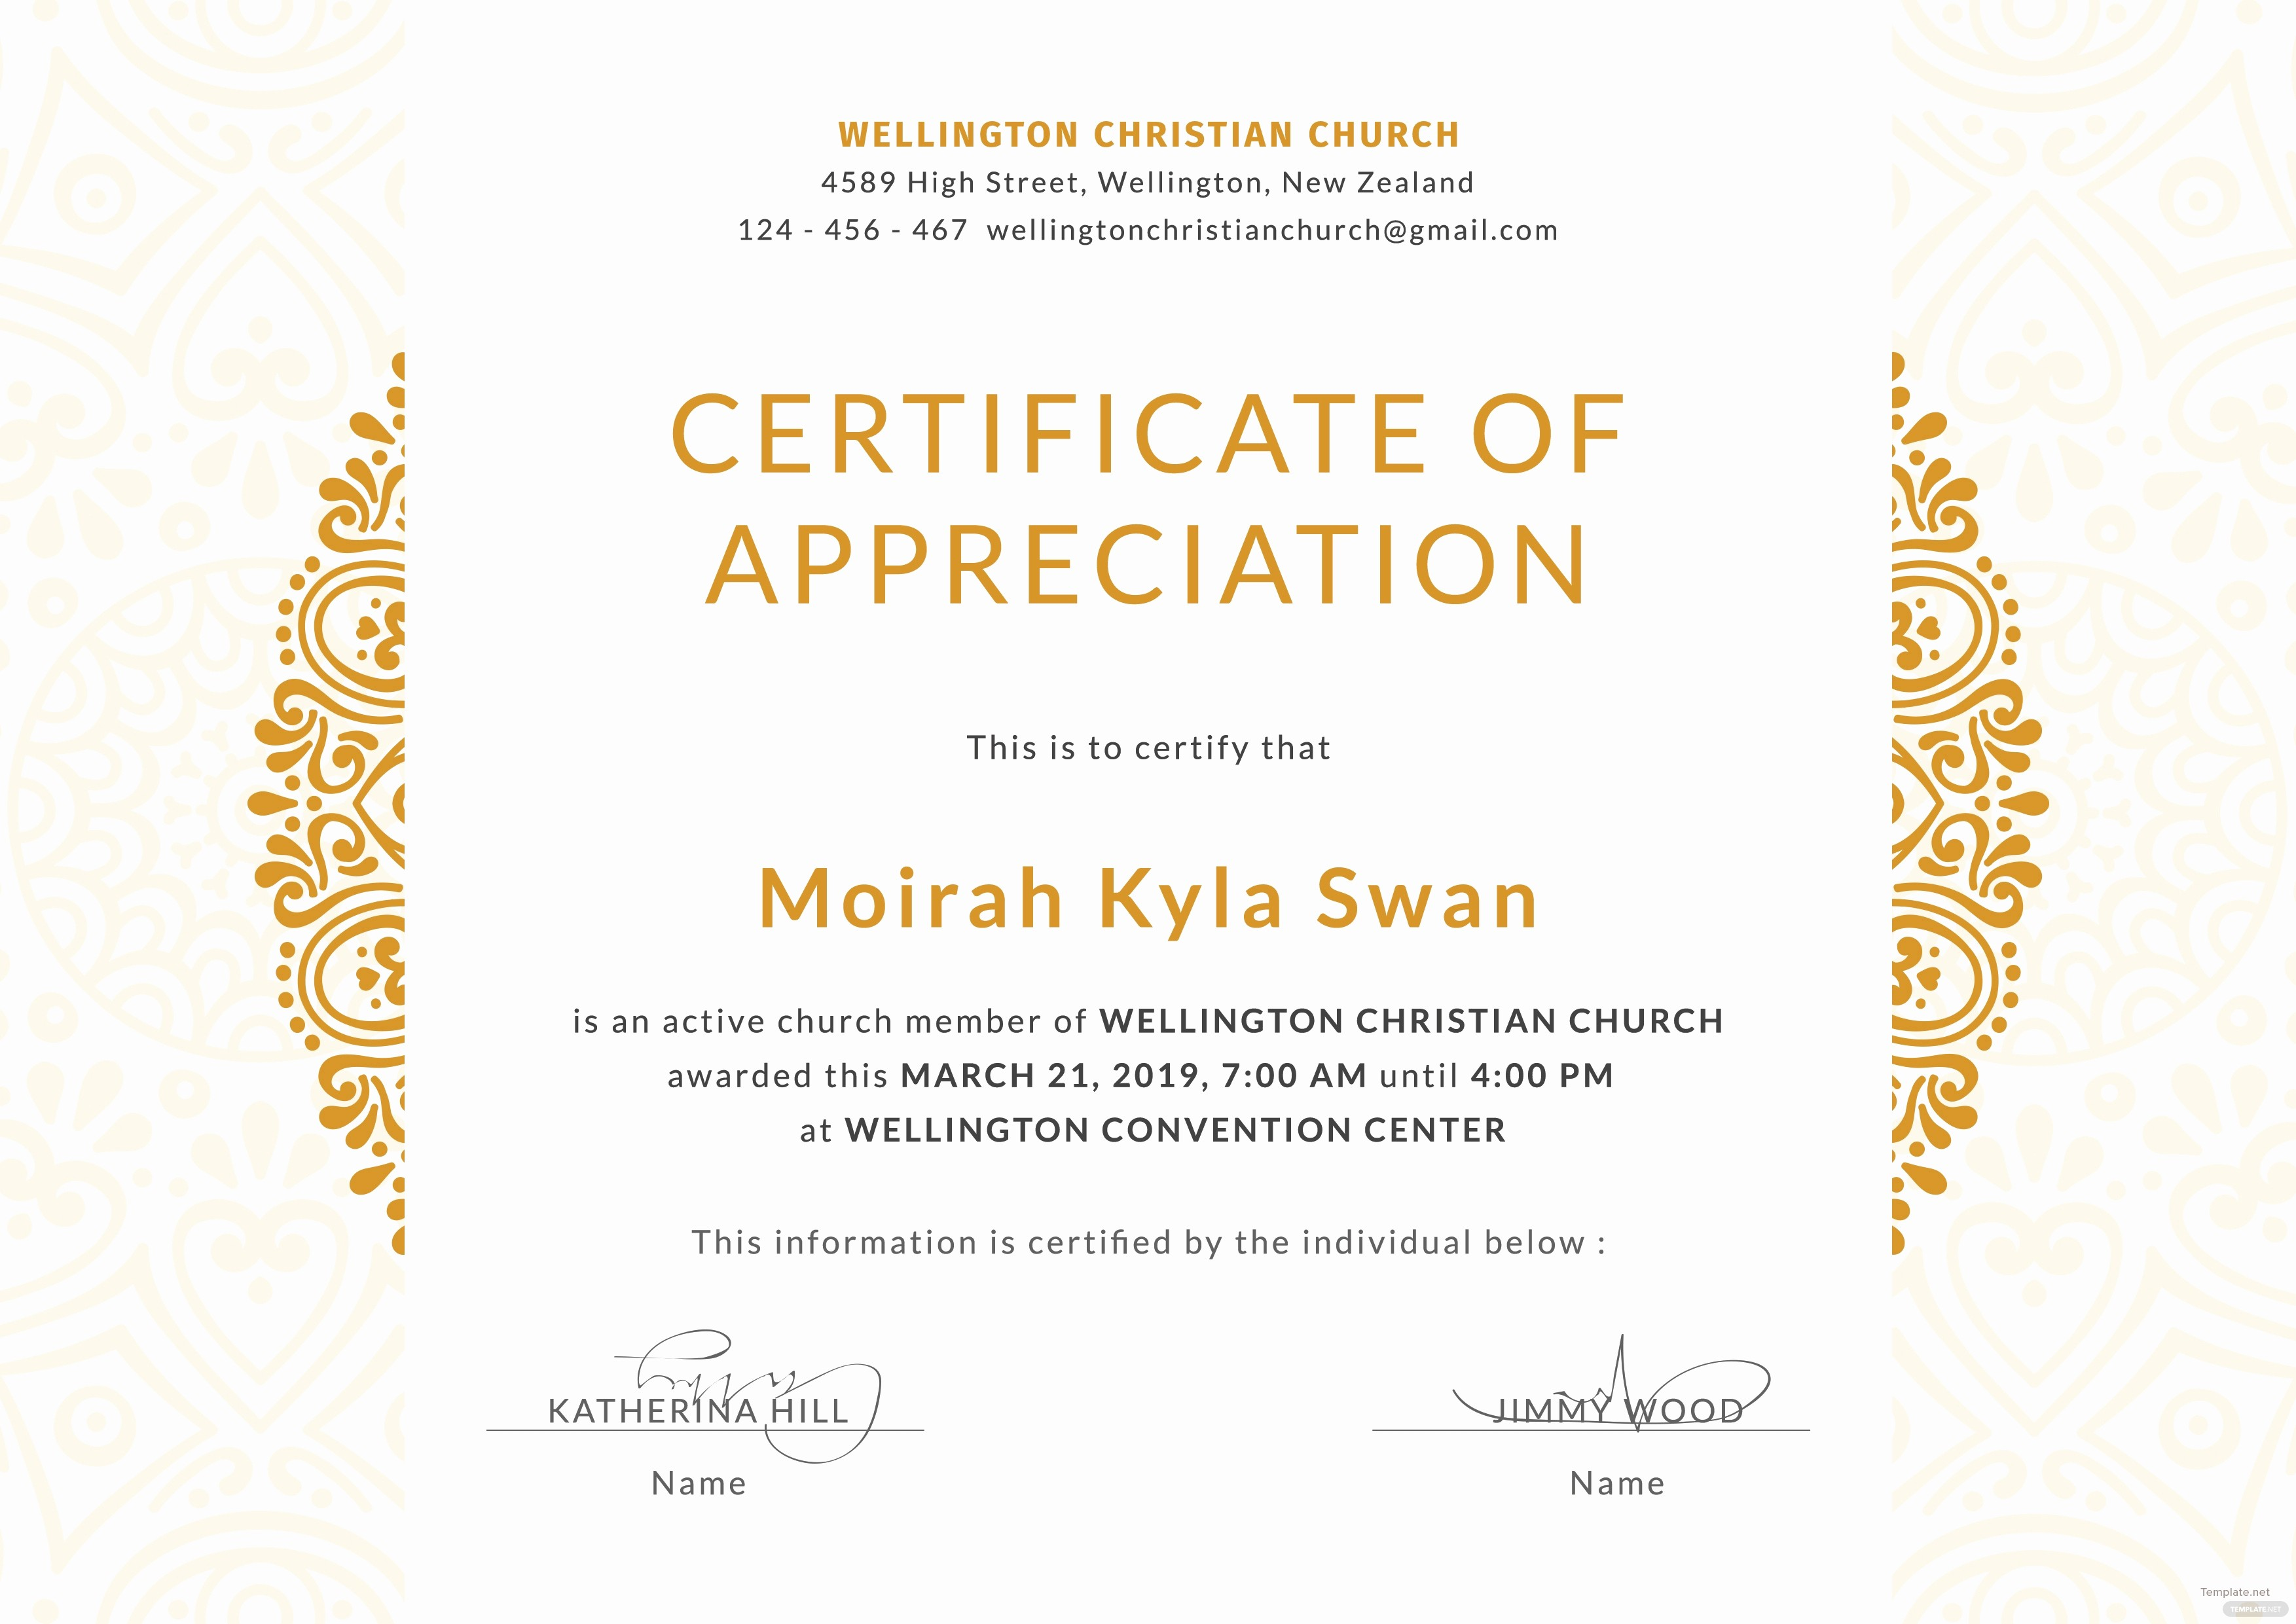 Template for Certificate Of Appreciation Lovely Free Church Certificate Of Appreciation Template In Adobe